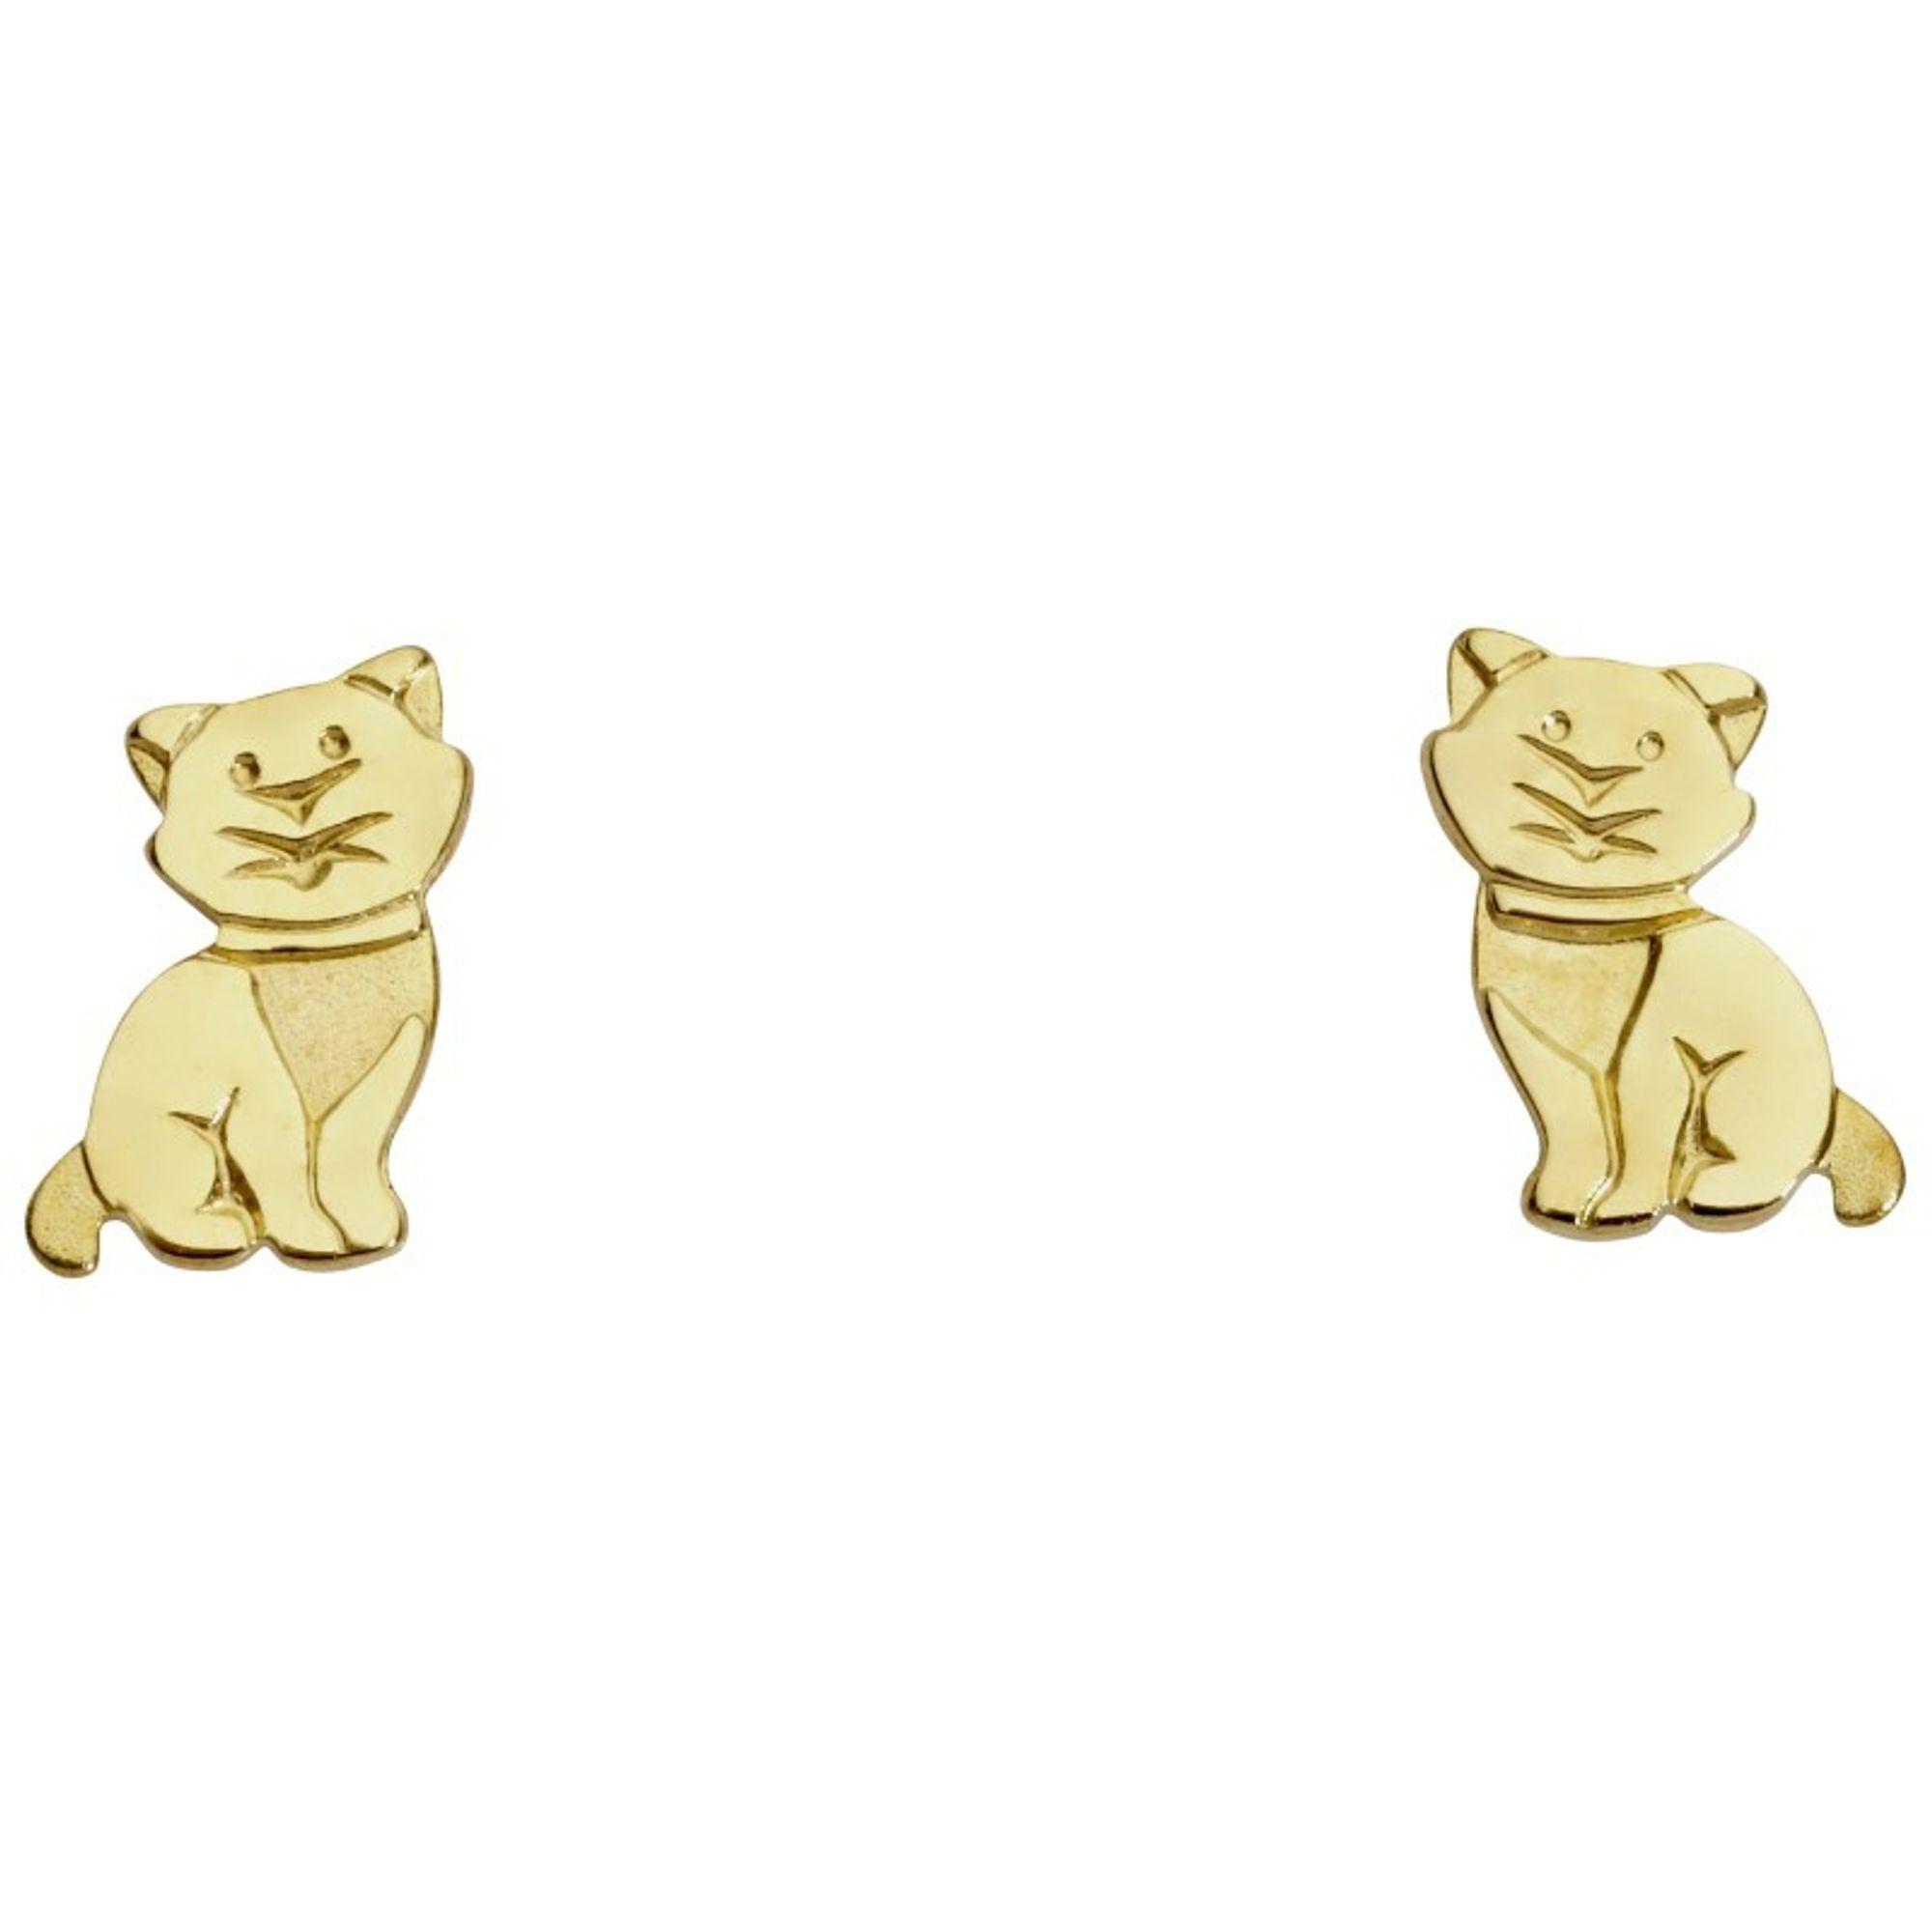 Basic Gold KI46 Mädchen Ohrstecker Katze 14 Karat (585) Gelbgold